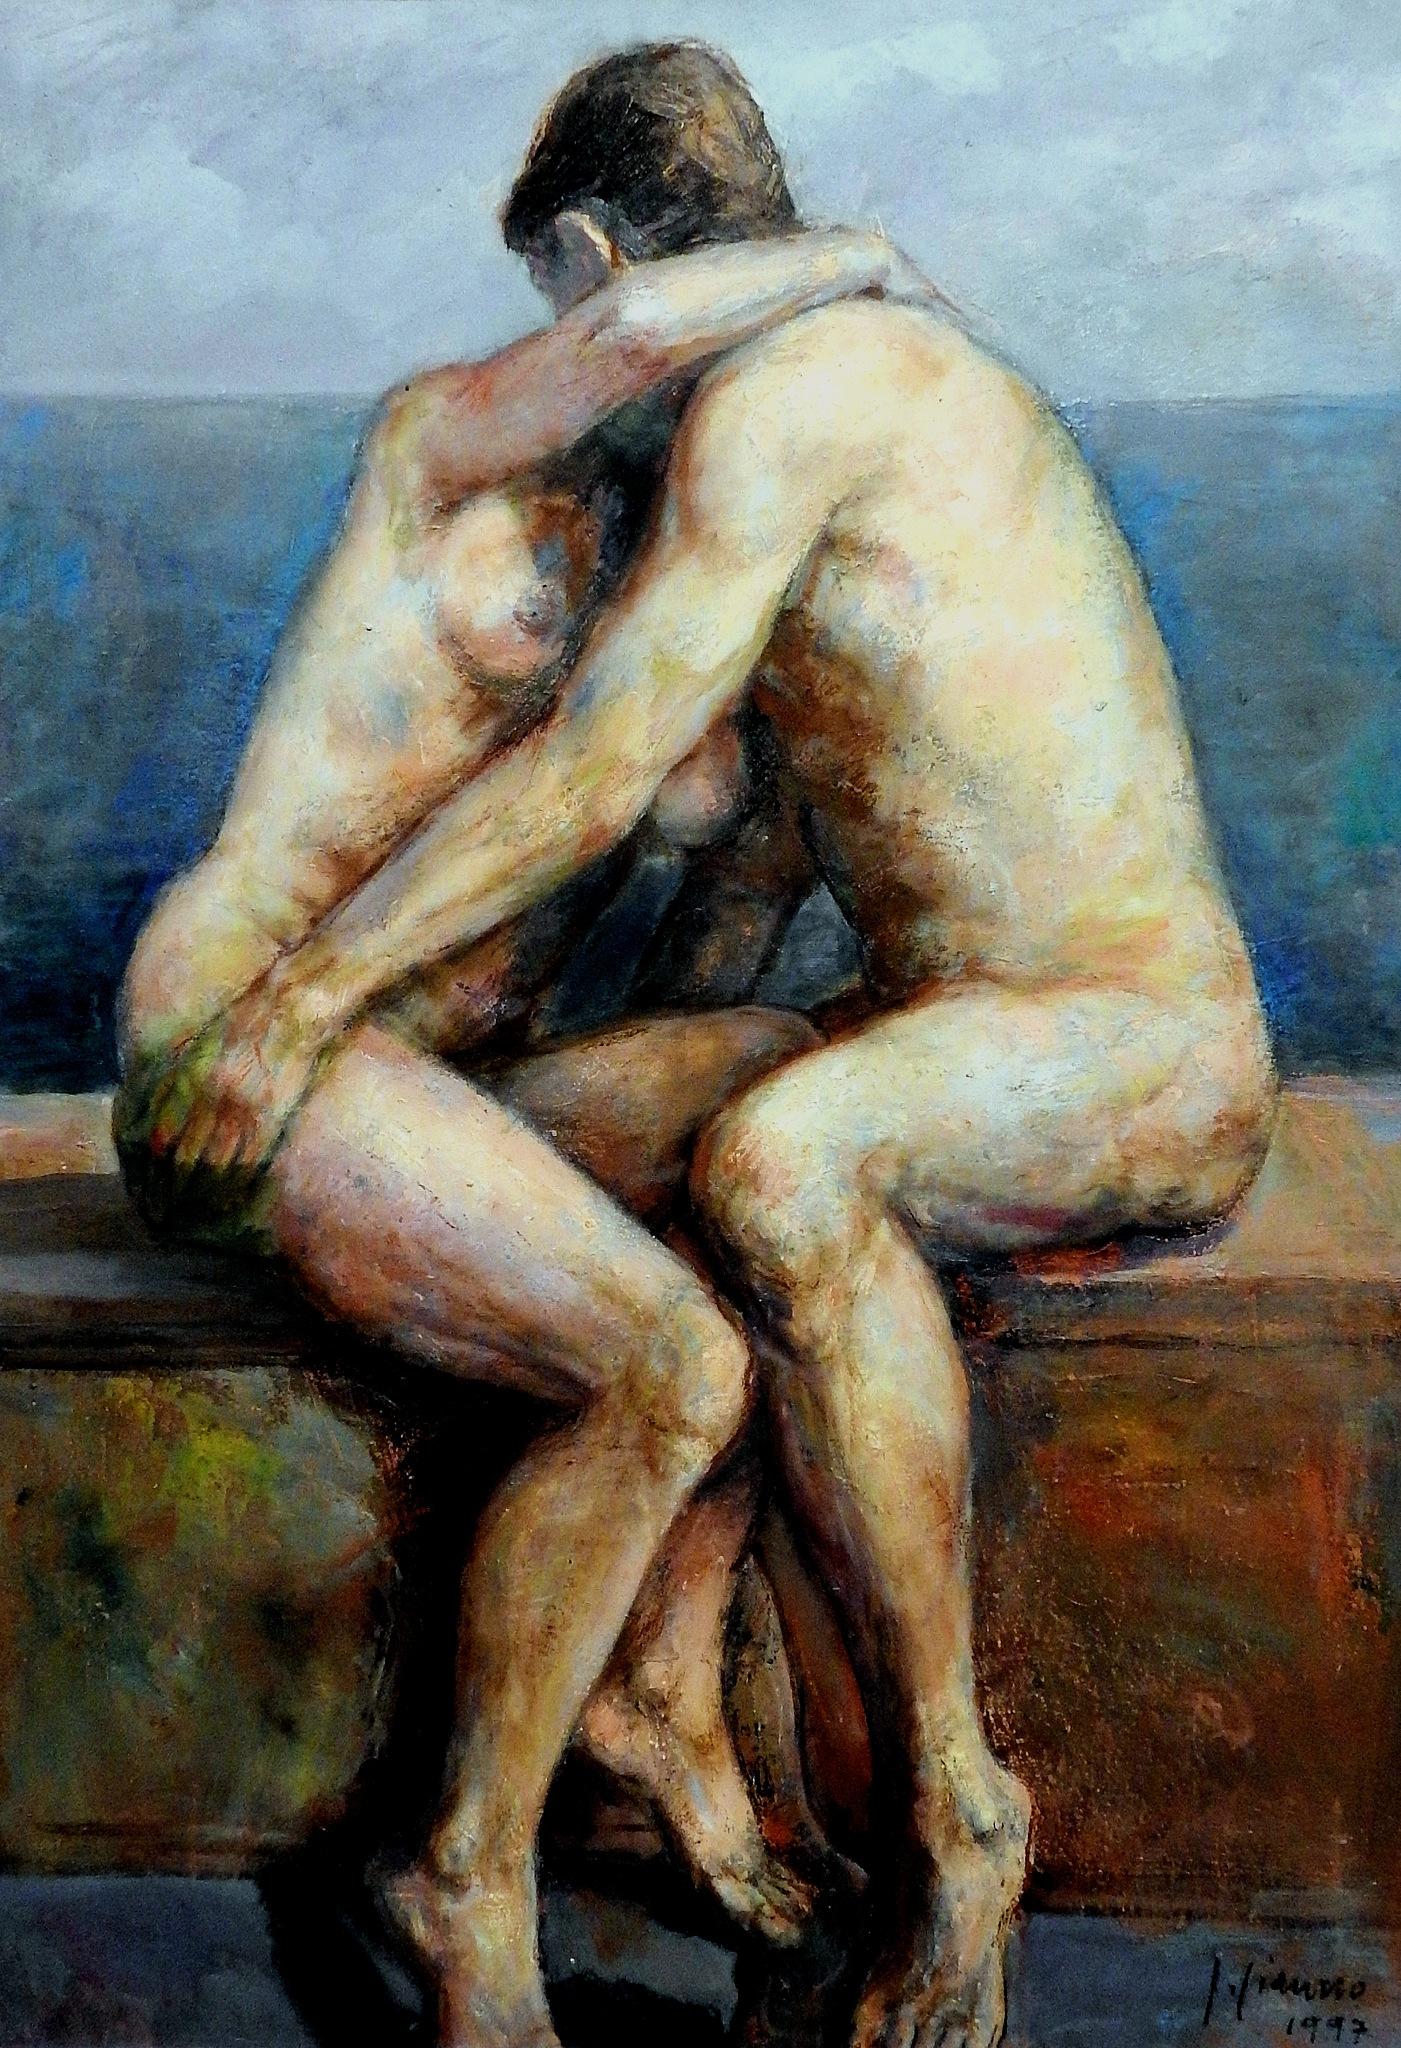 Salvatore Ciaurro - Amanti - P.A.N. Napoli - Napoli Expo' Art Polis  by Arnaldo De Lisio